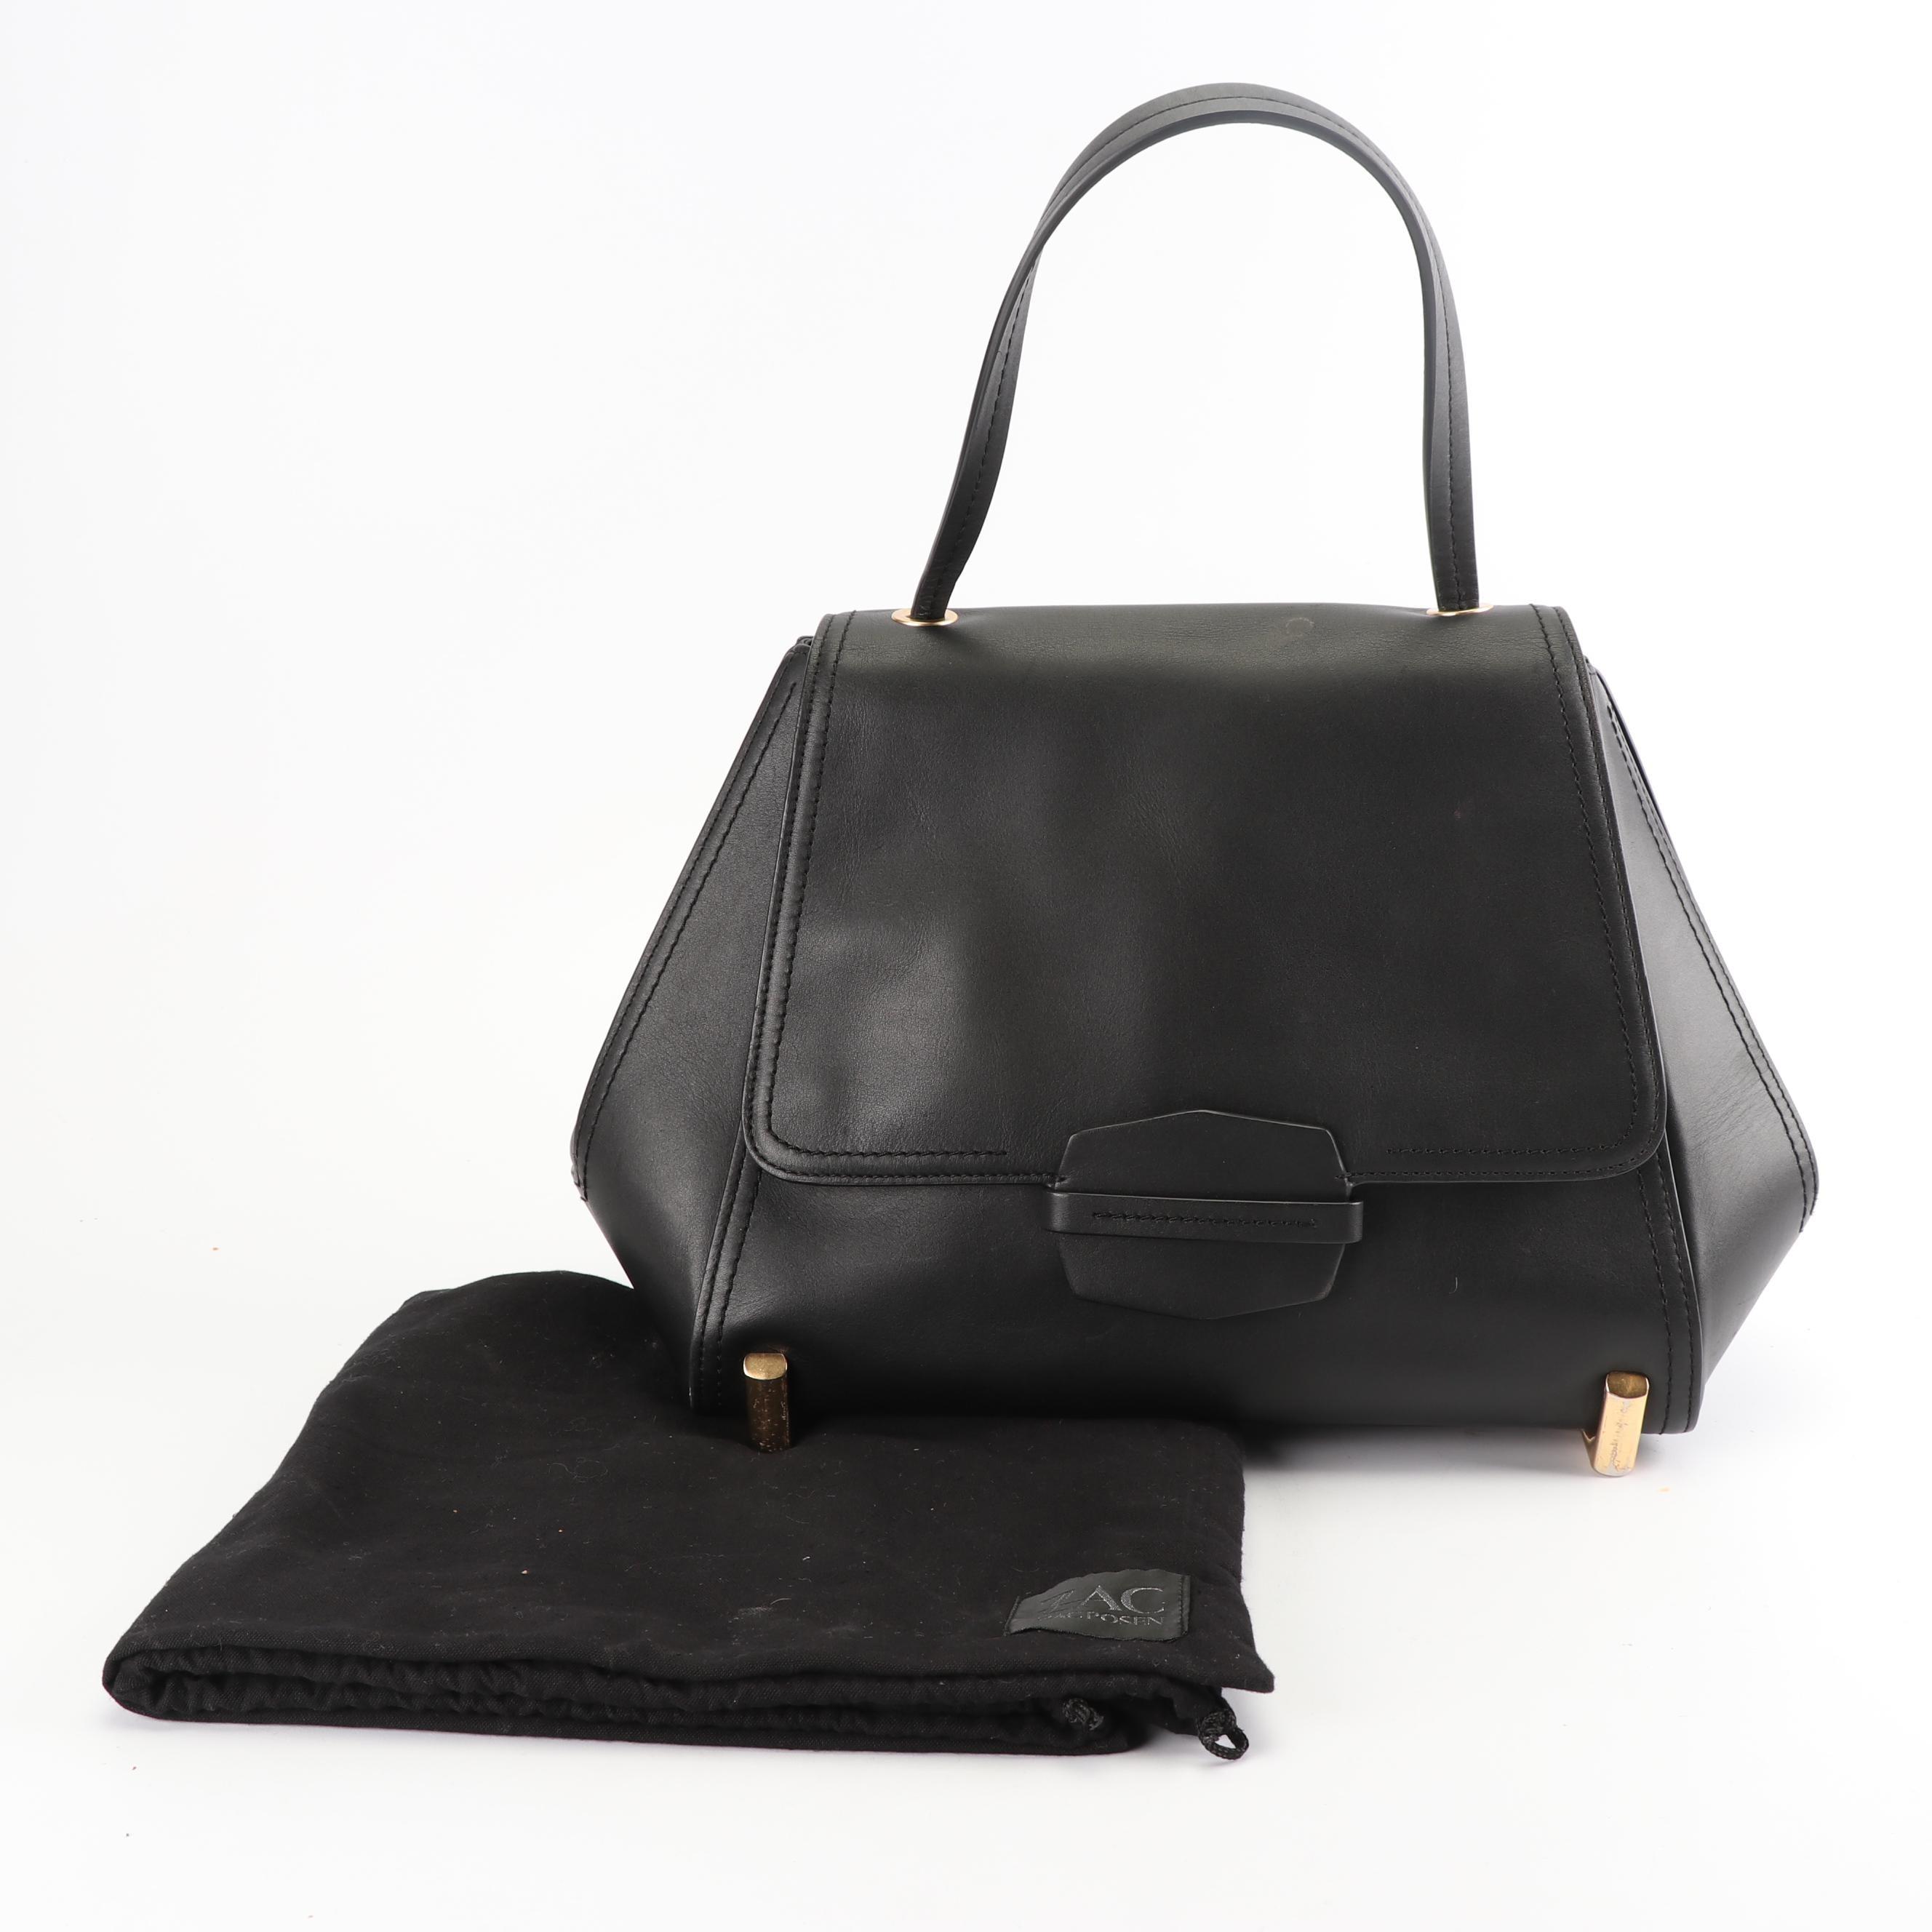 ZAC Zac Posen Black Leather Handbag